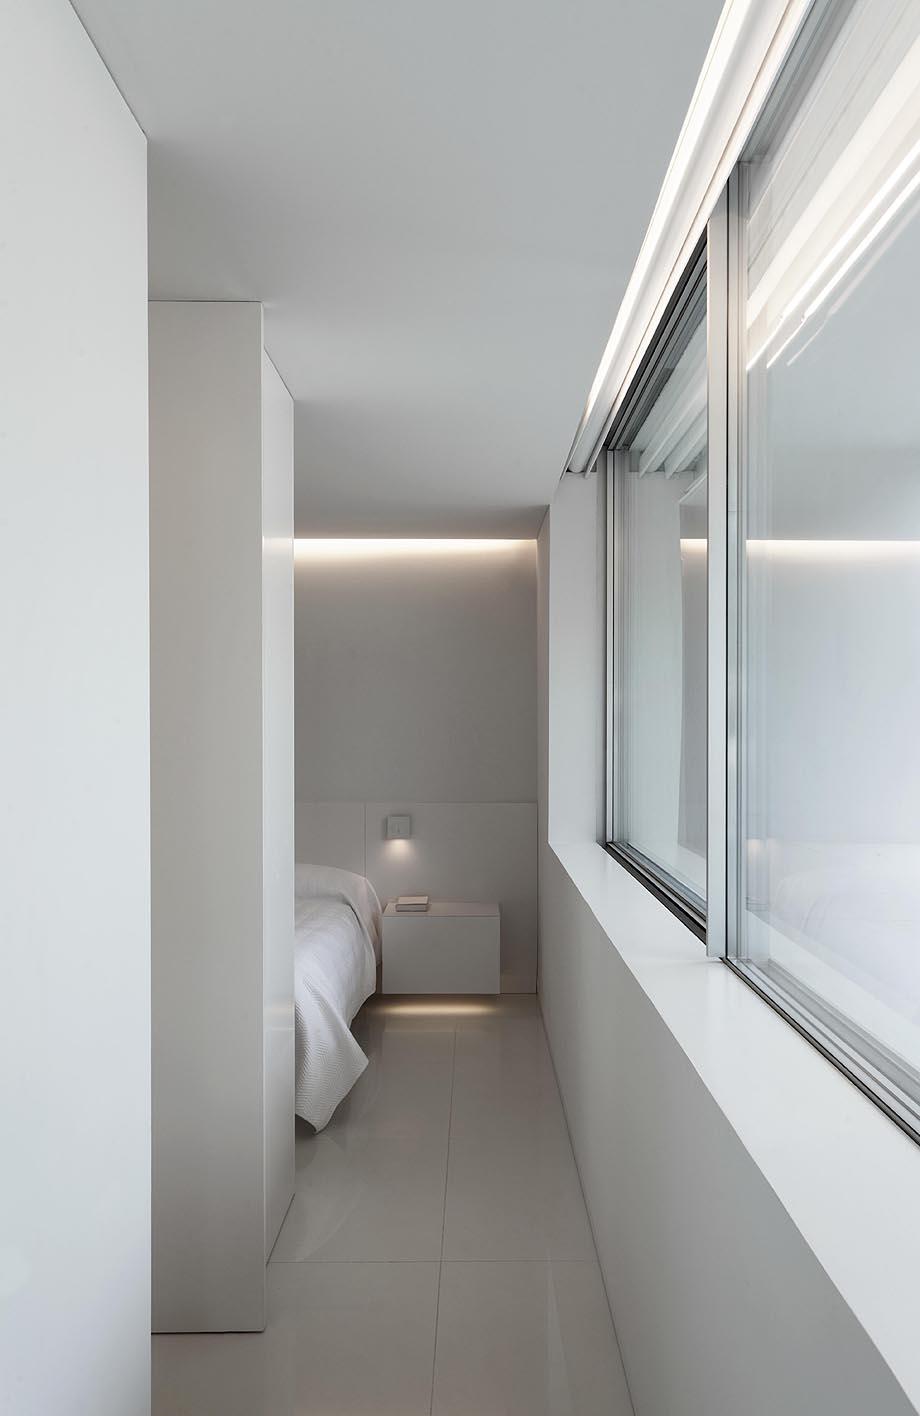 breeze house de fran silvestre arquitectos (15)